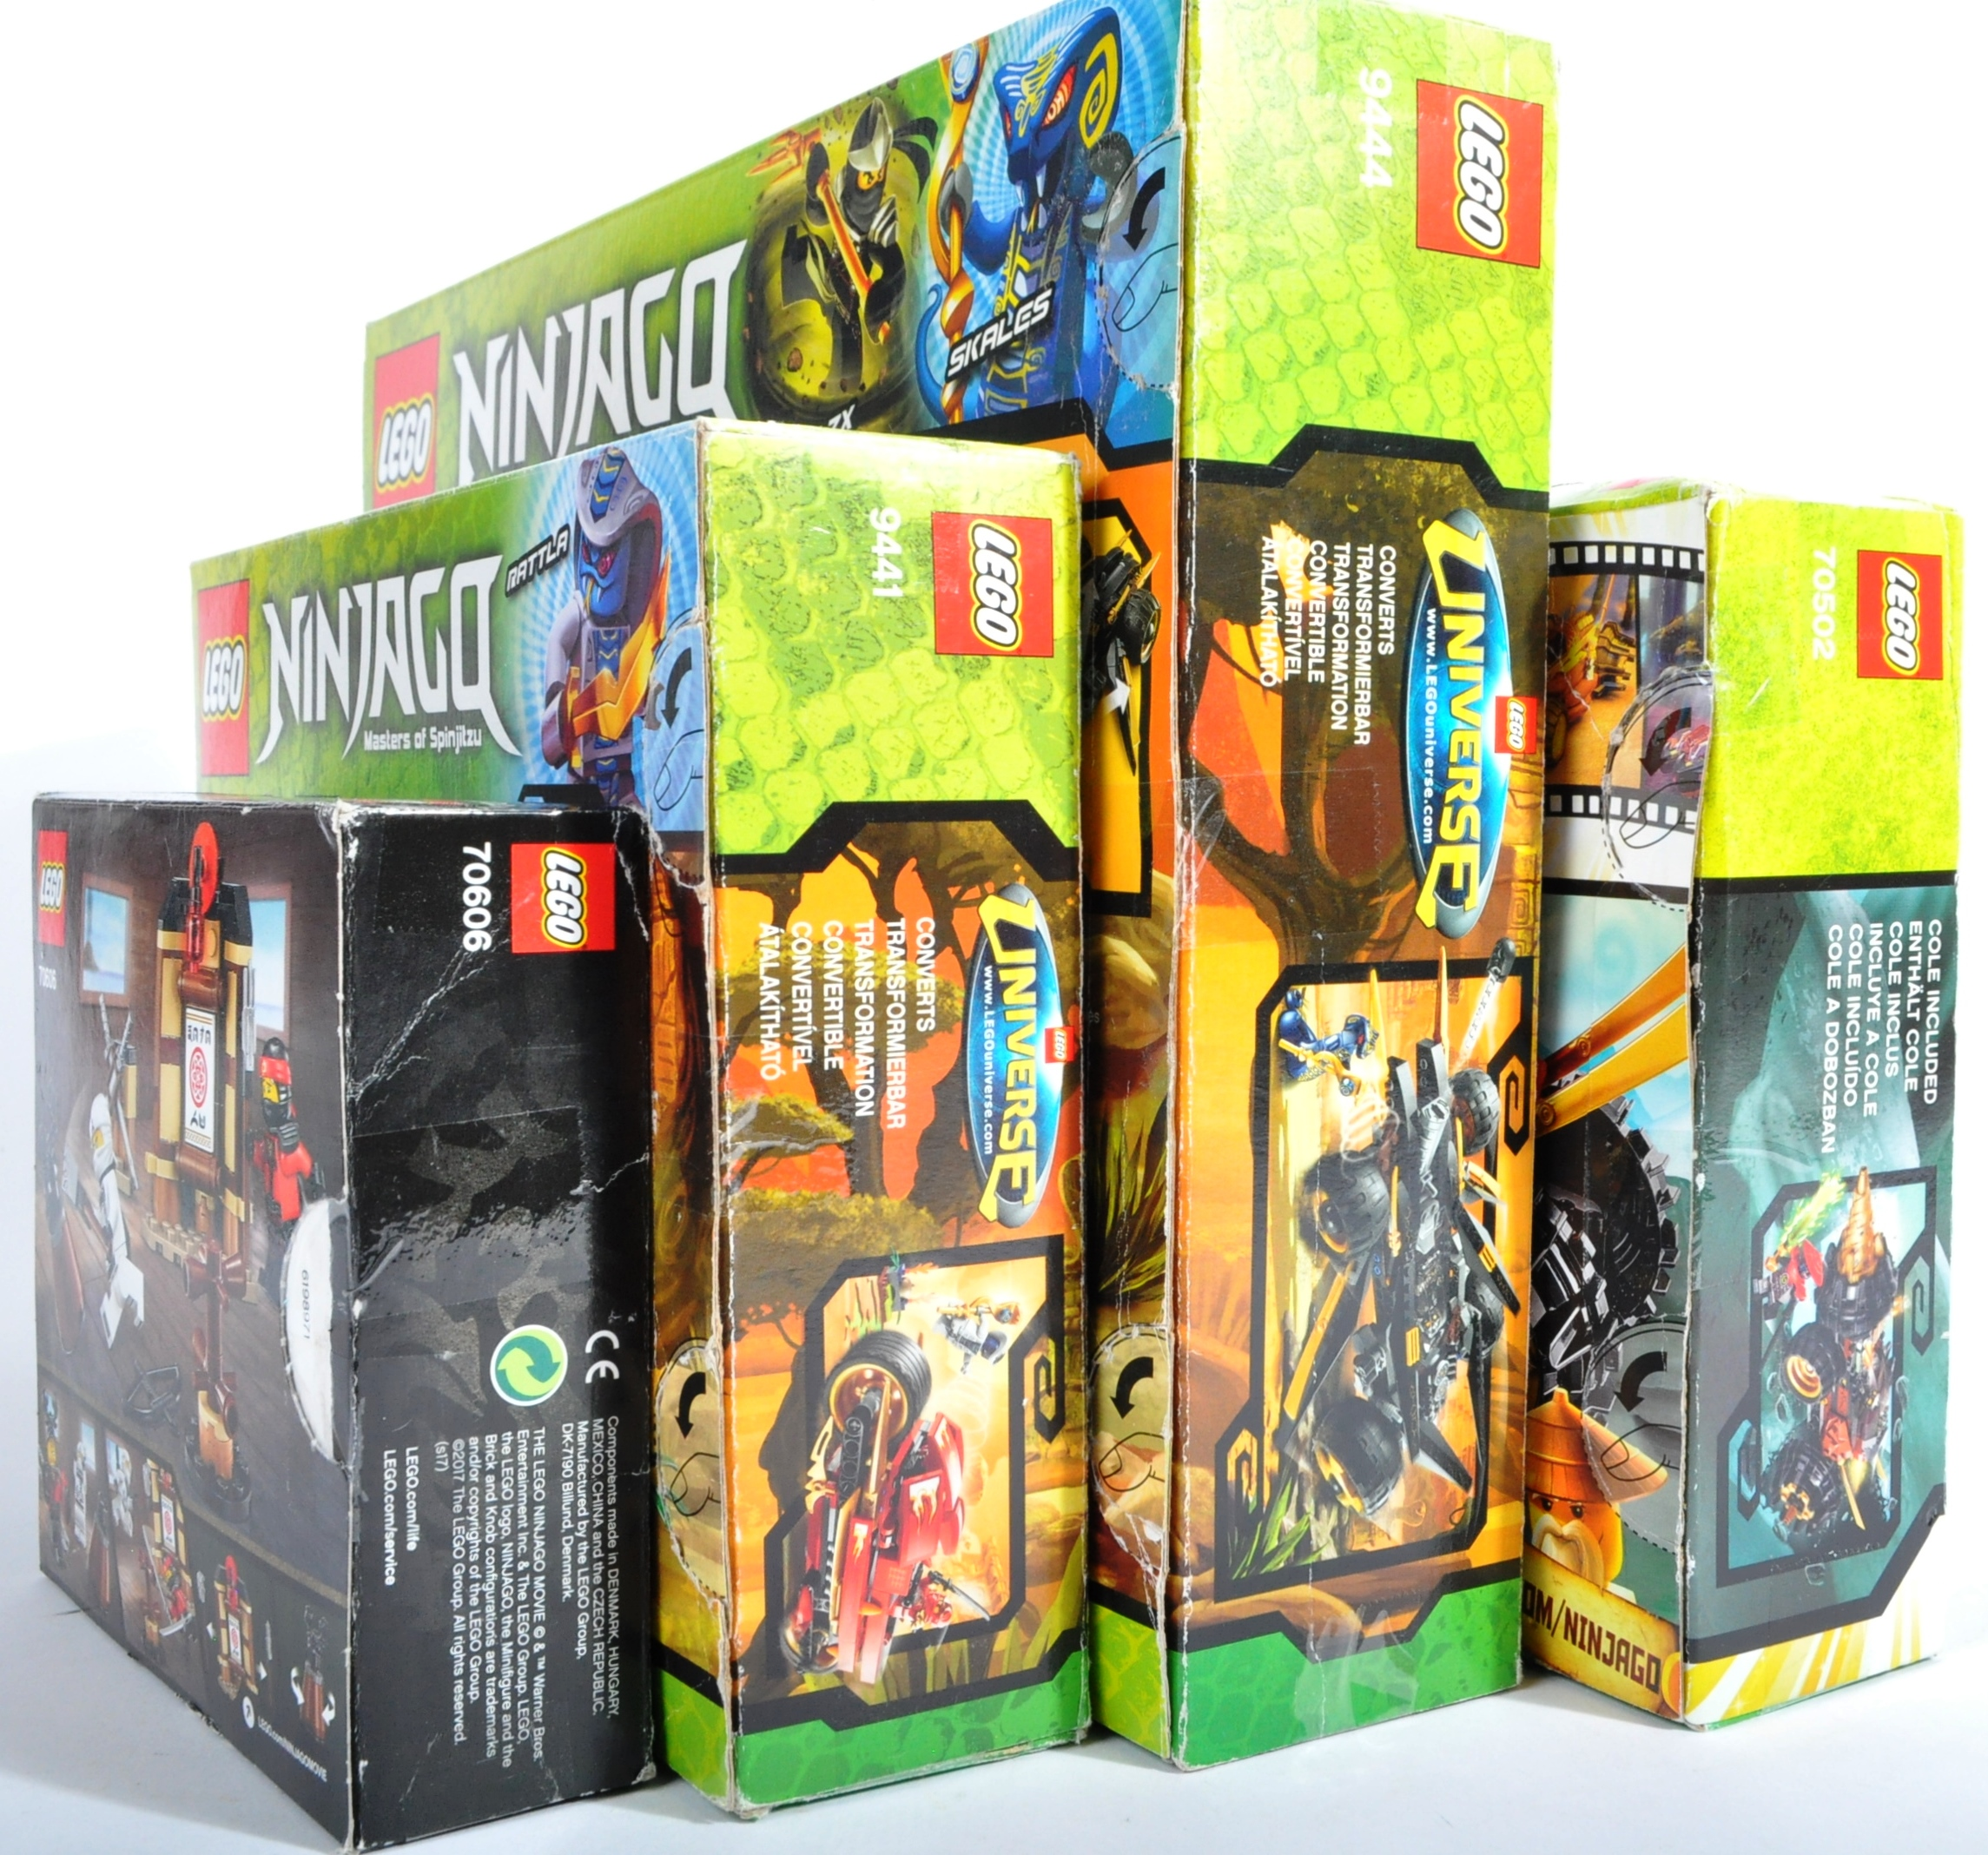 LEGO SETS - LEGO NINJAGO - 9441 / 70606 / 70502 / 9444 - Image 4 of 4